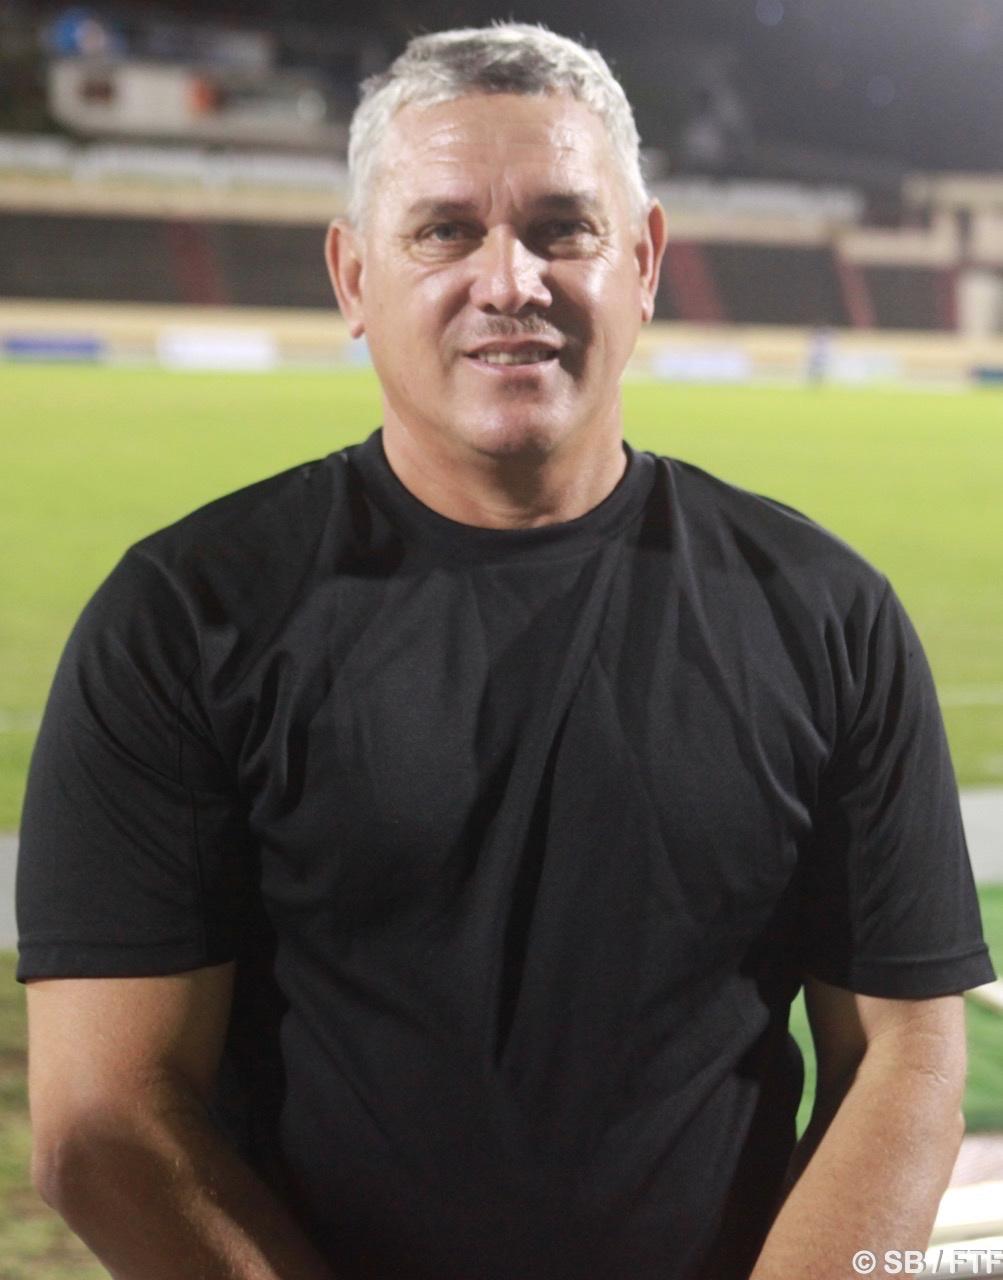 Football - Championnat OFC U19 : Tahiti perd 2-1 contre la Nouvelle Zélande